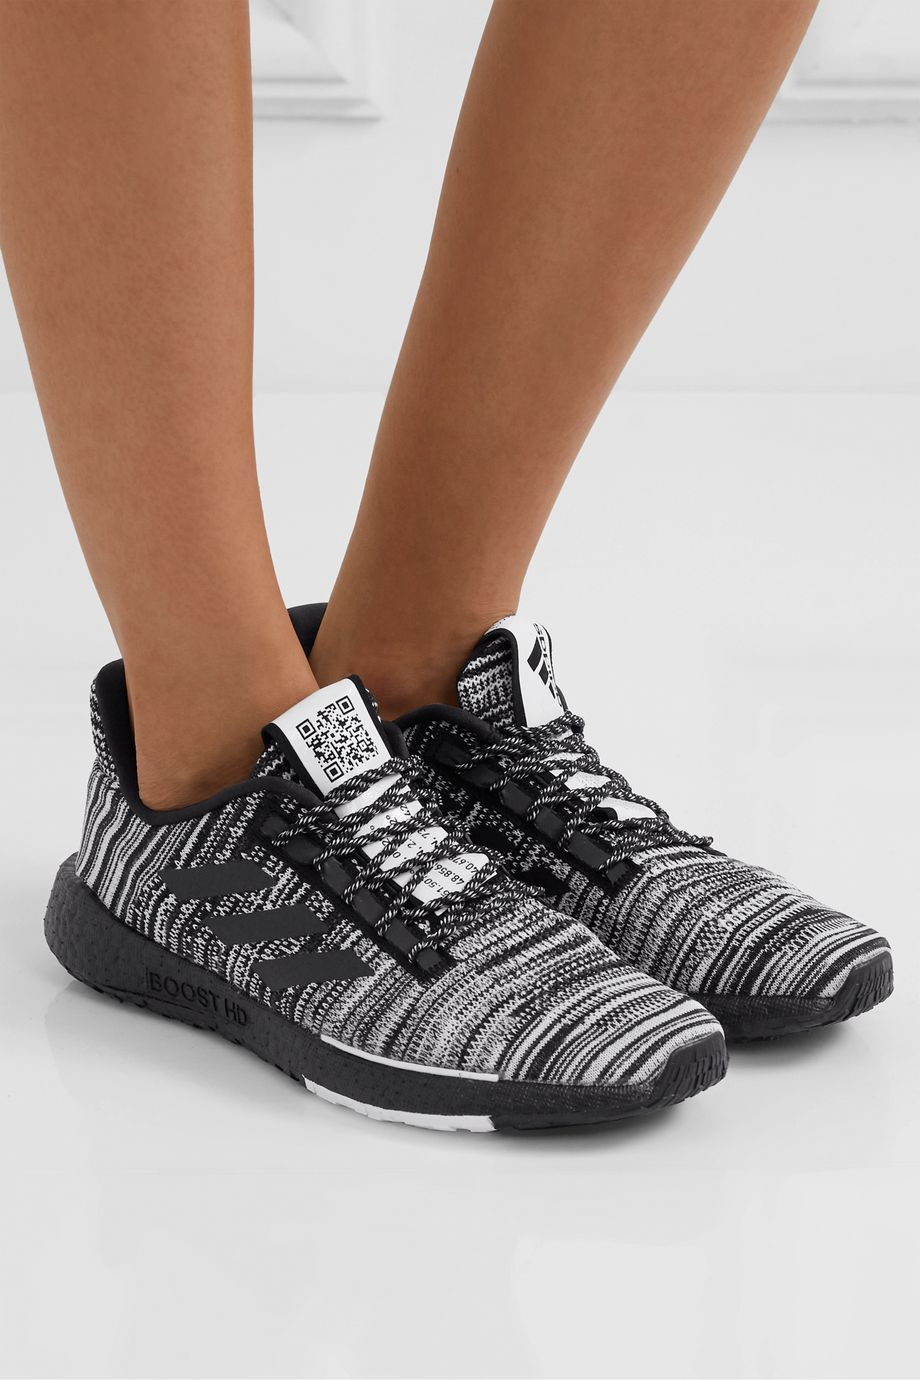 adidas Originals Baskets en mailles crochetées Pulseboost x Missoni